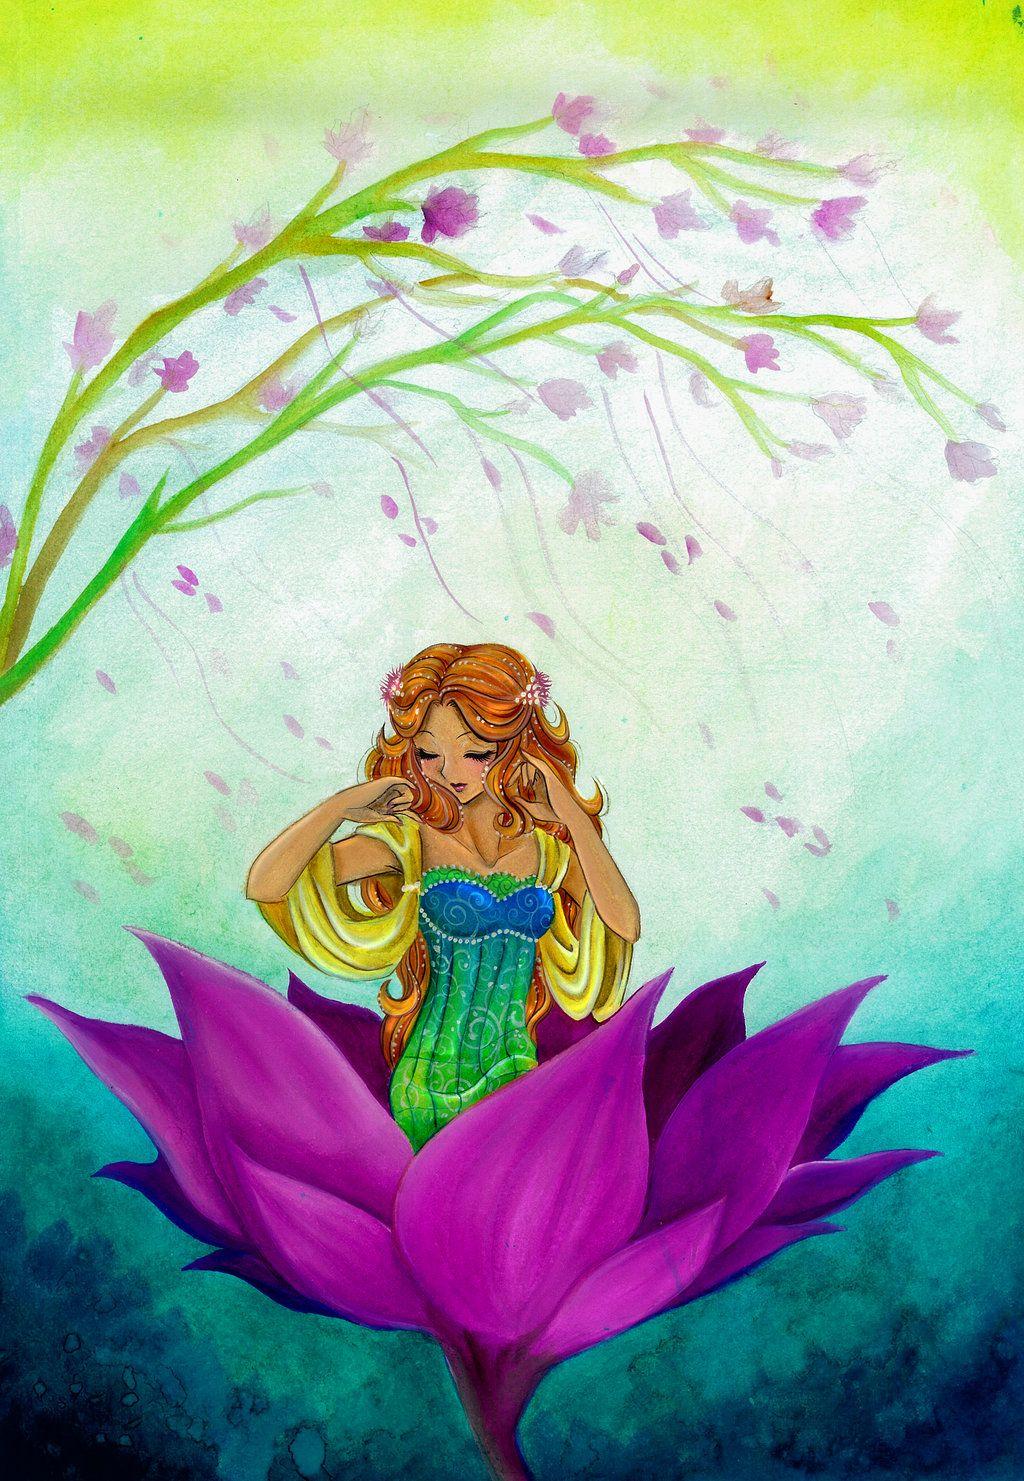 Thumbelina by Bloodhaunt on deviantART | Fairytale art ...